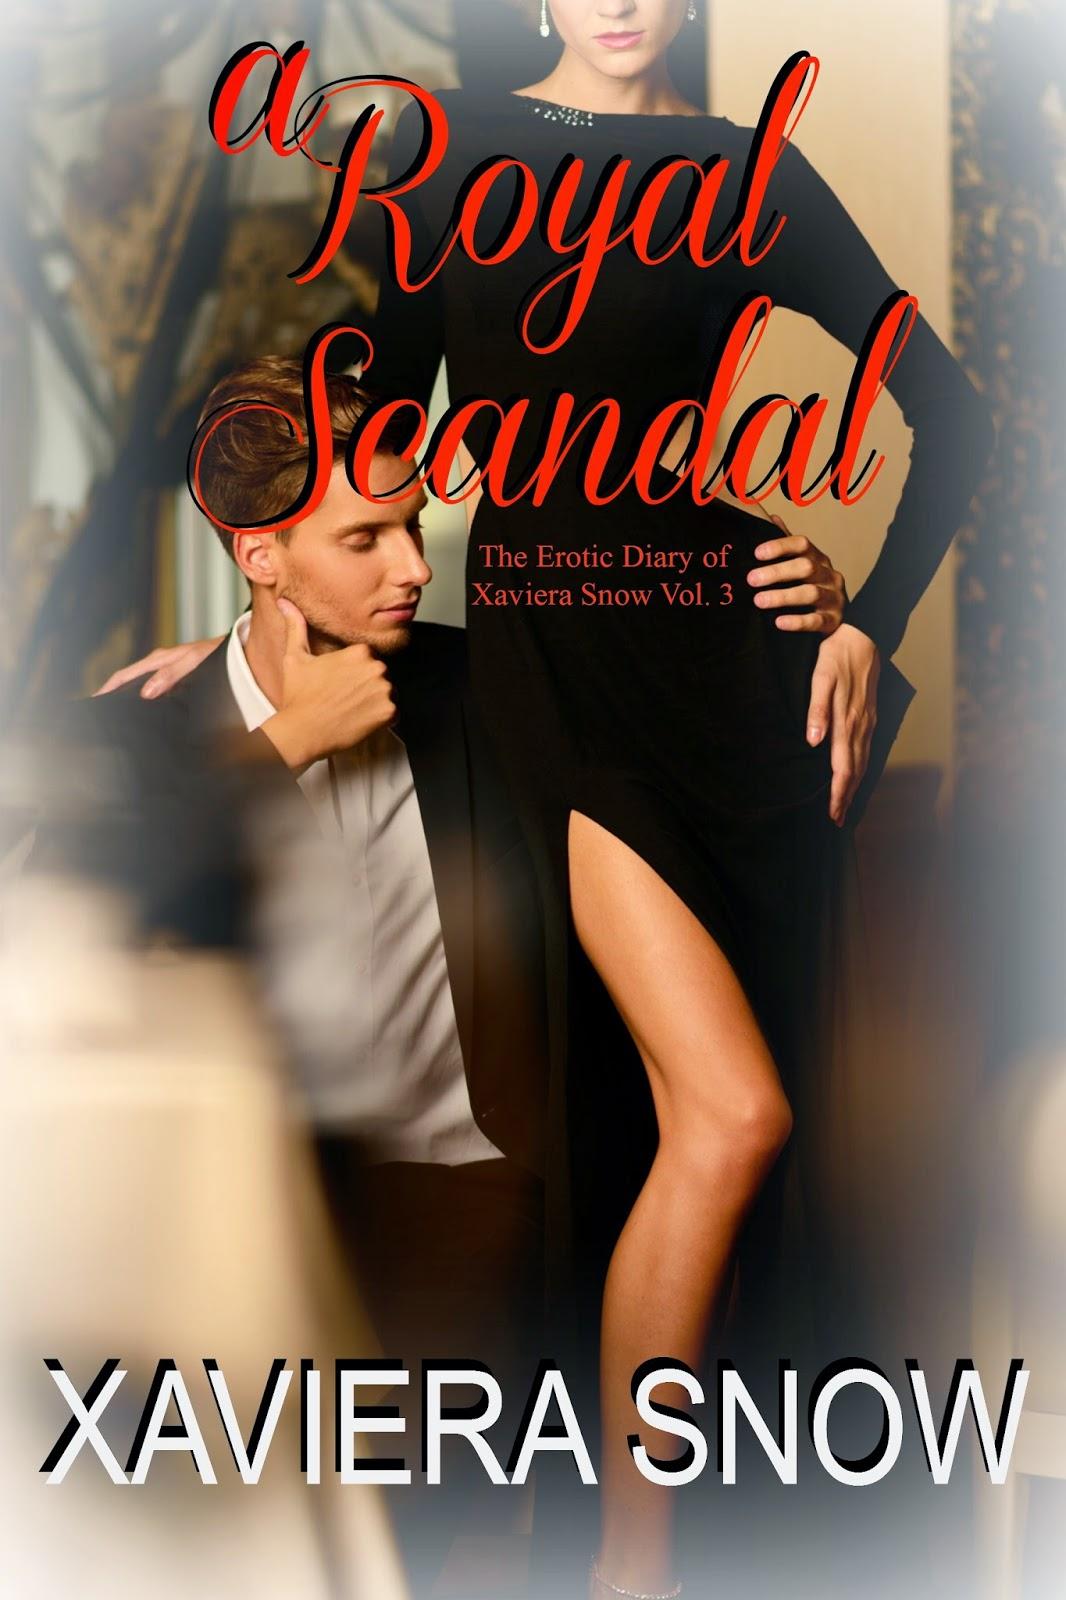 http://www.amazon.com/Royal-Scandal-Erotic-Diary-Xaviera-ebook/dp/B00O982Q38/ref=sr_1_17?ie=UTF8&qid=1428132490&sr=8-17&keywords=MICHELE+GWYNN